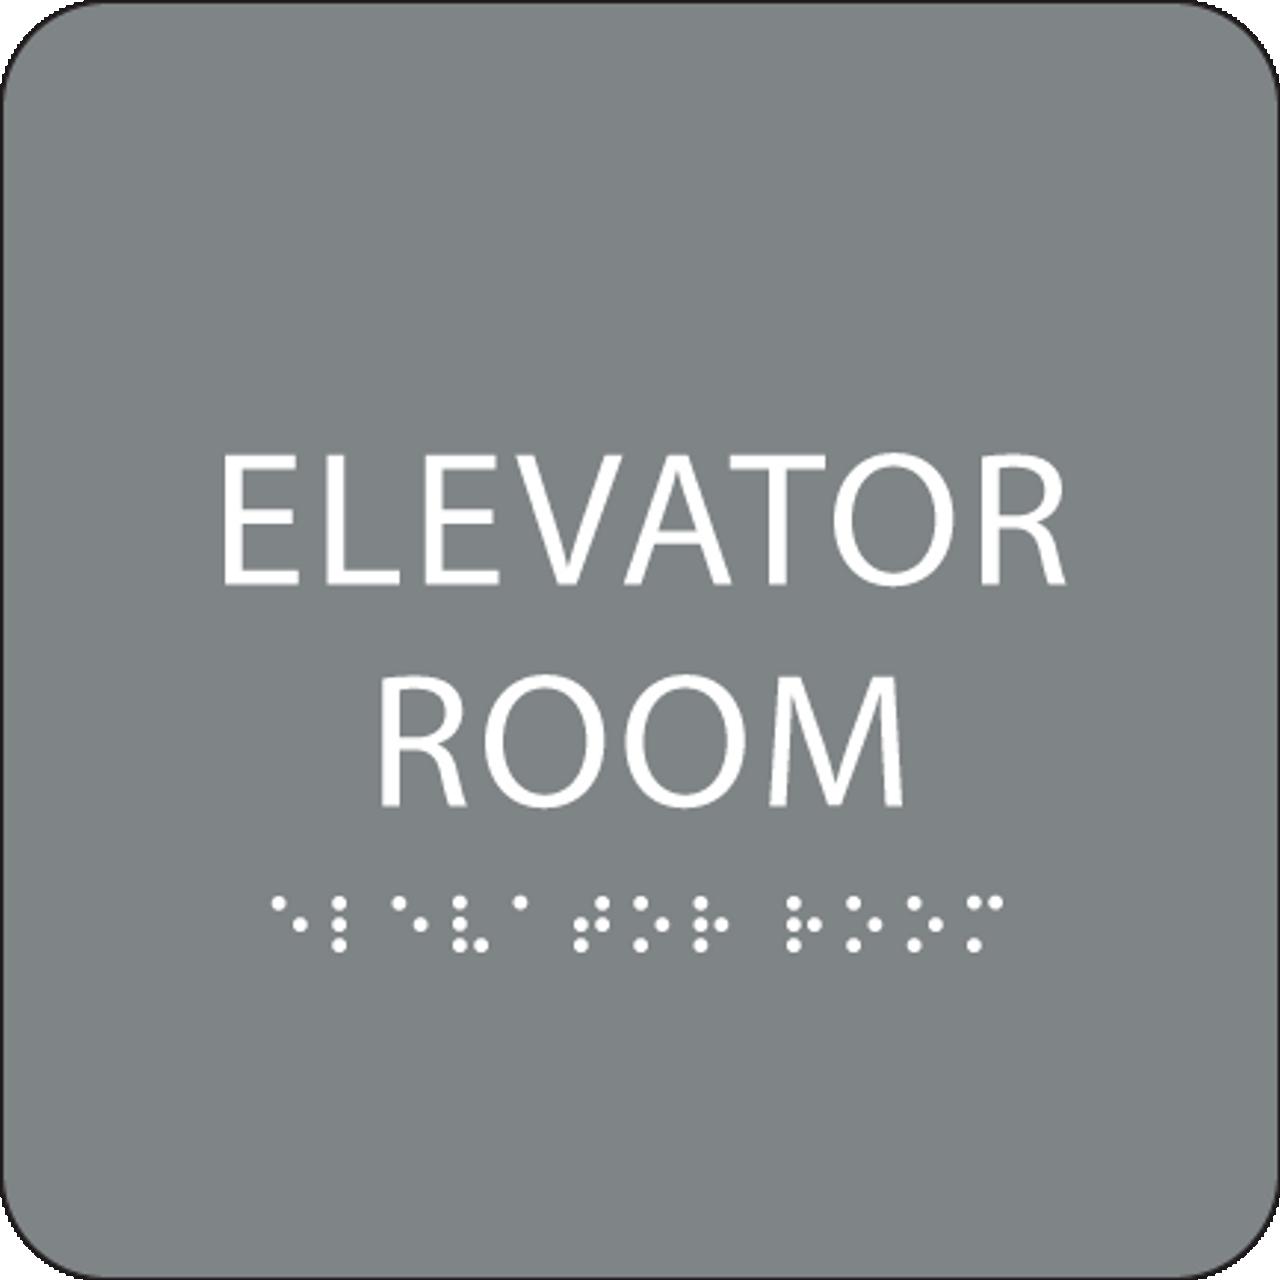 Grey Elevator Room ADA Sign